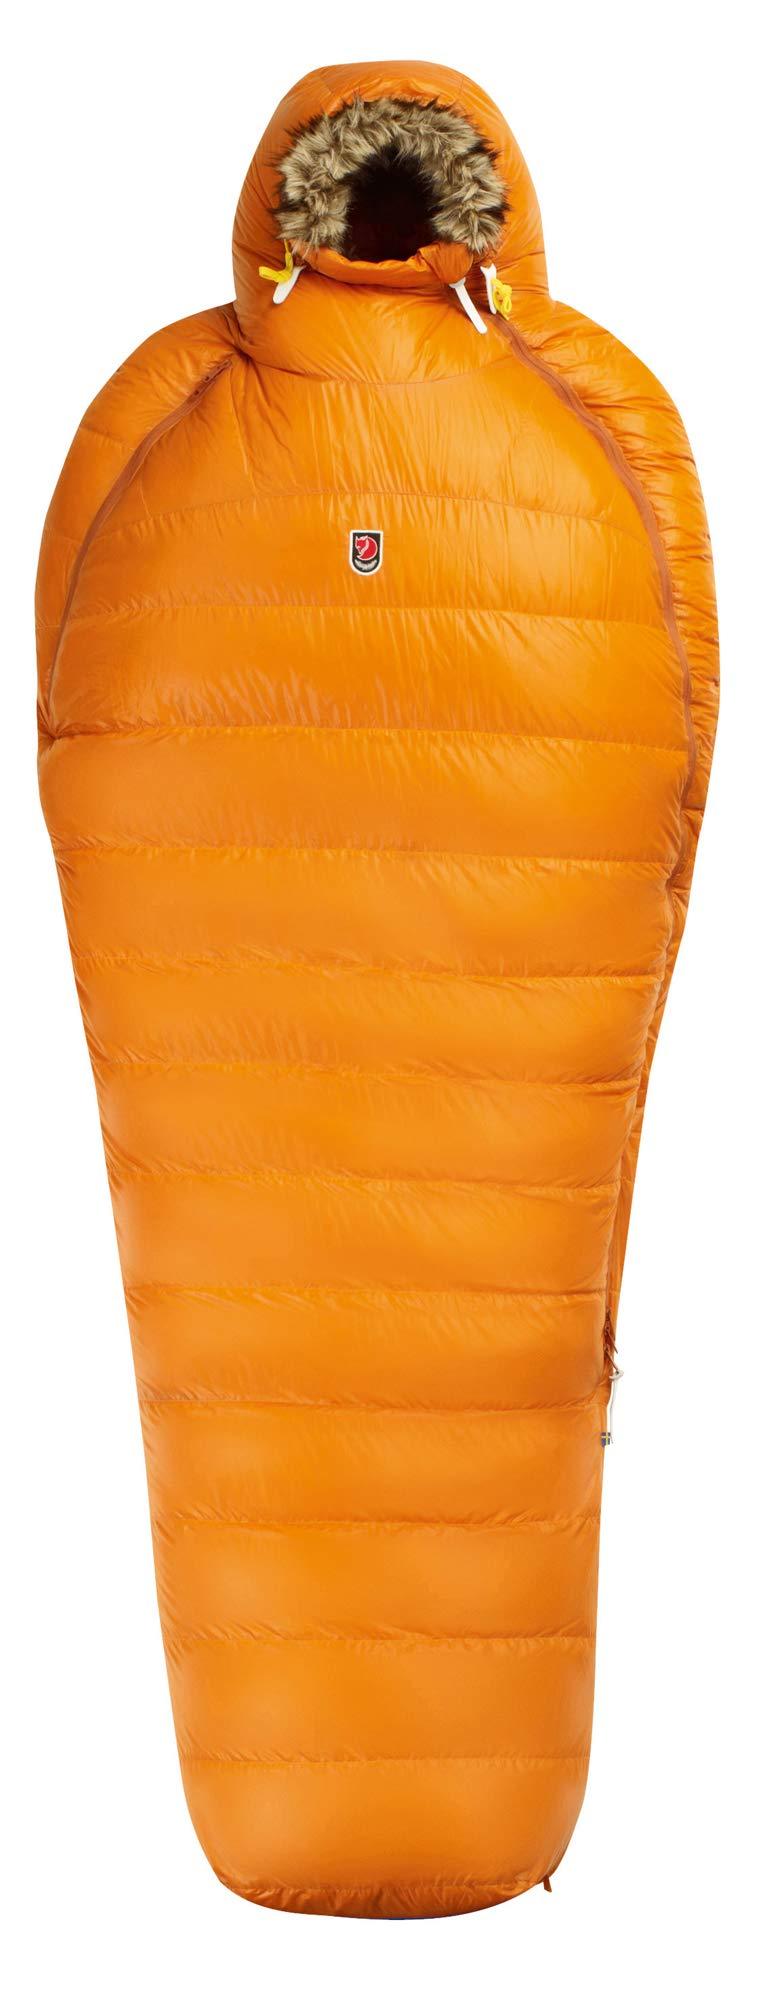 Fjällräven Unisex– Erwachsene Polar-20 Long Schlafsack, Burnt Orange, One